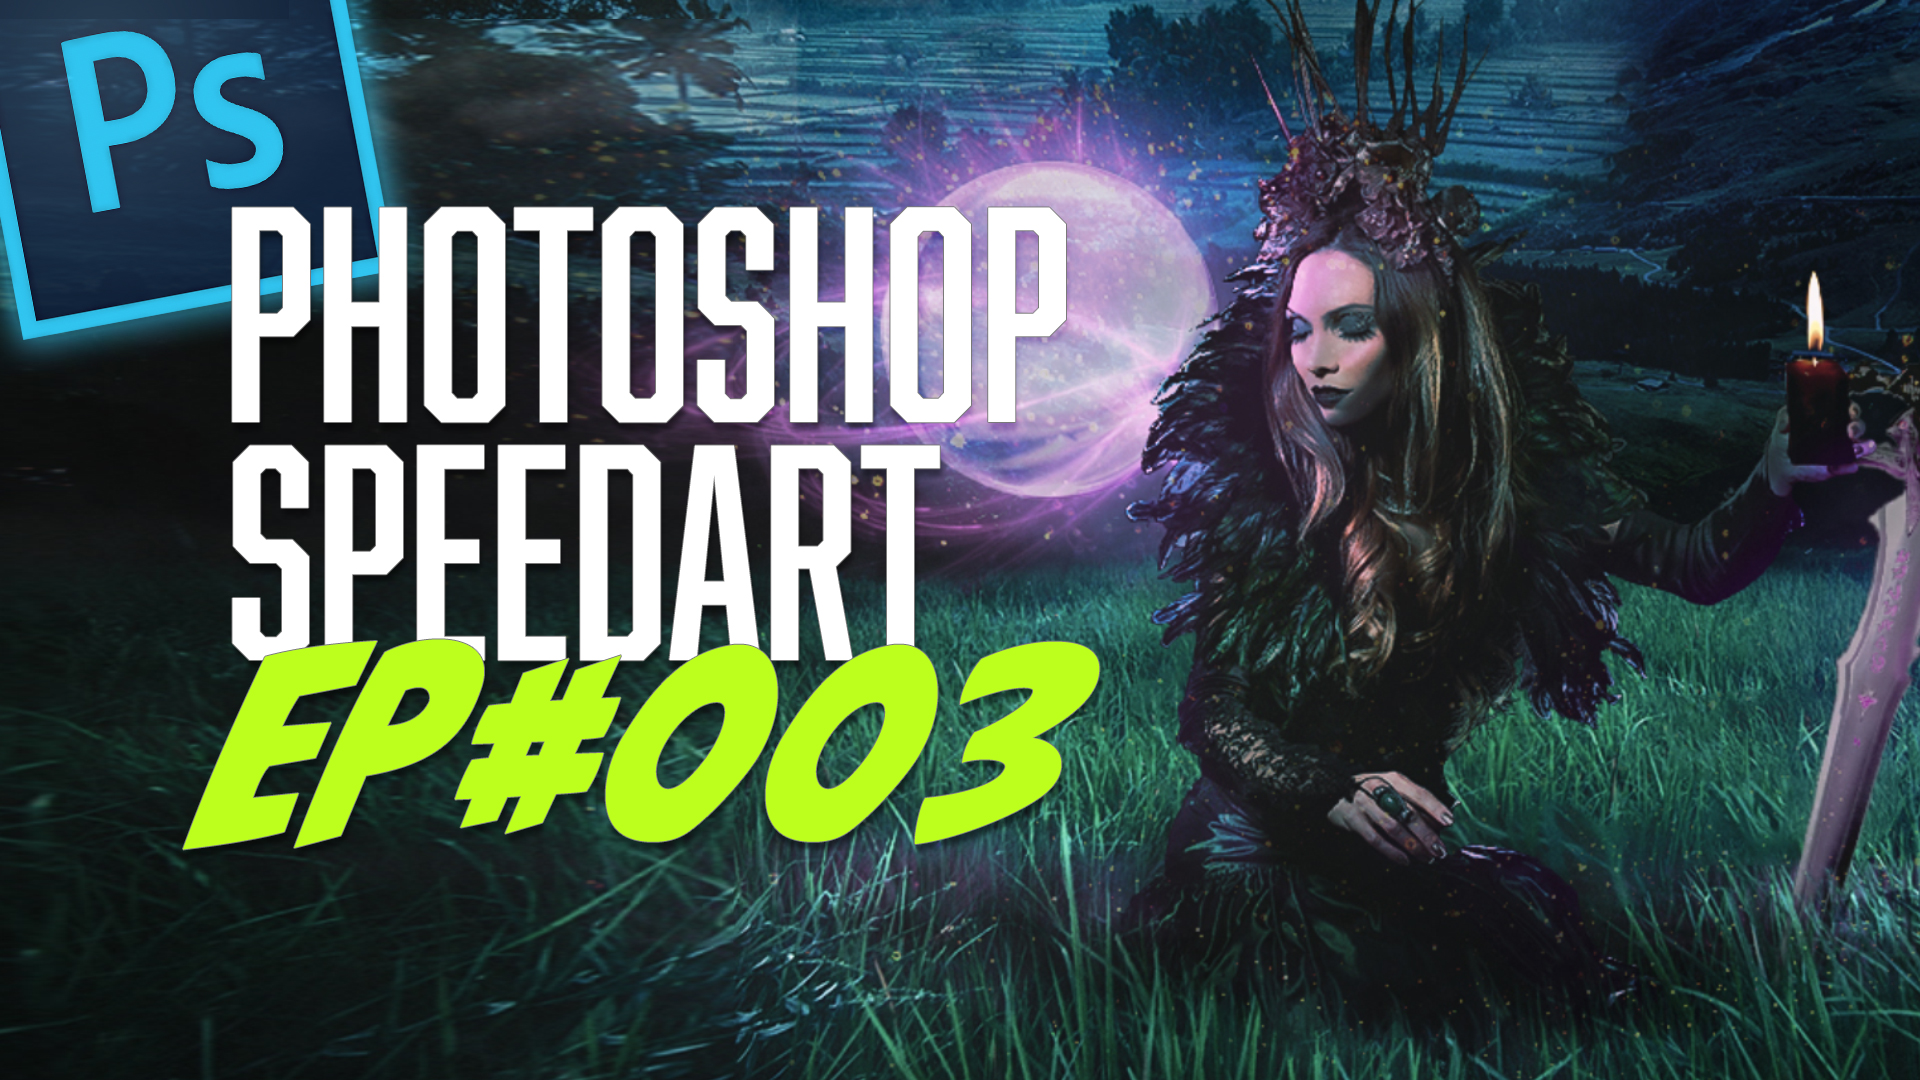 Witchcraft Photoshop Speed Art - Digital Artwork by Dominic Kabuth